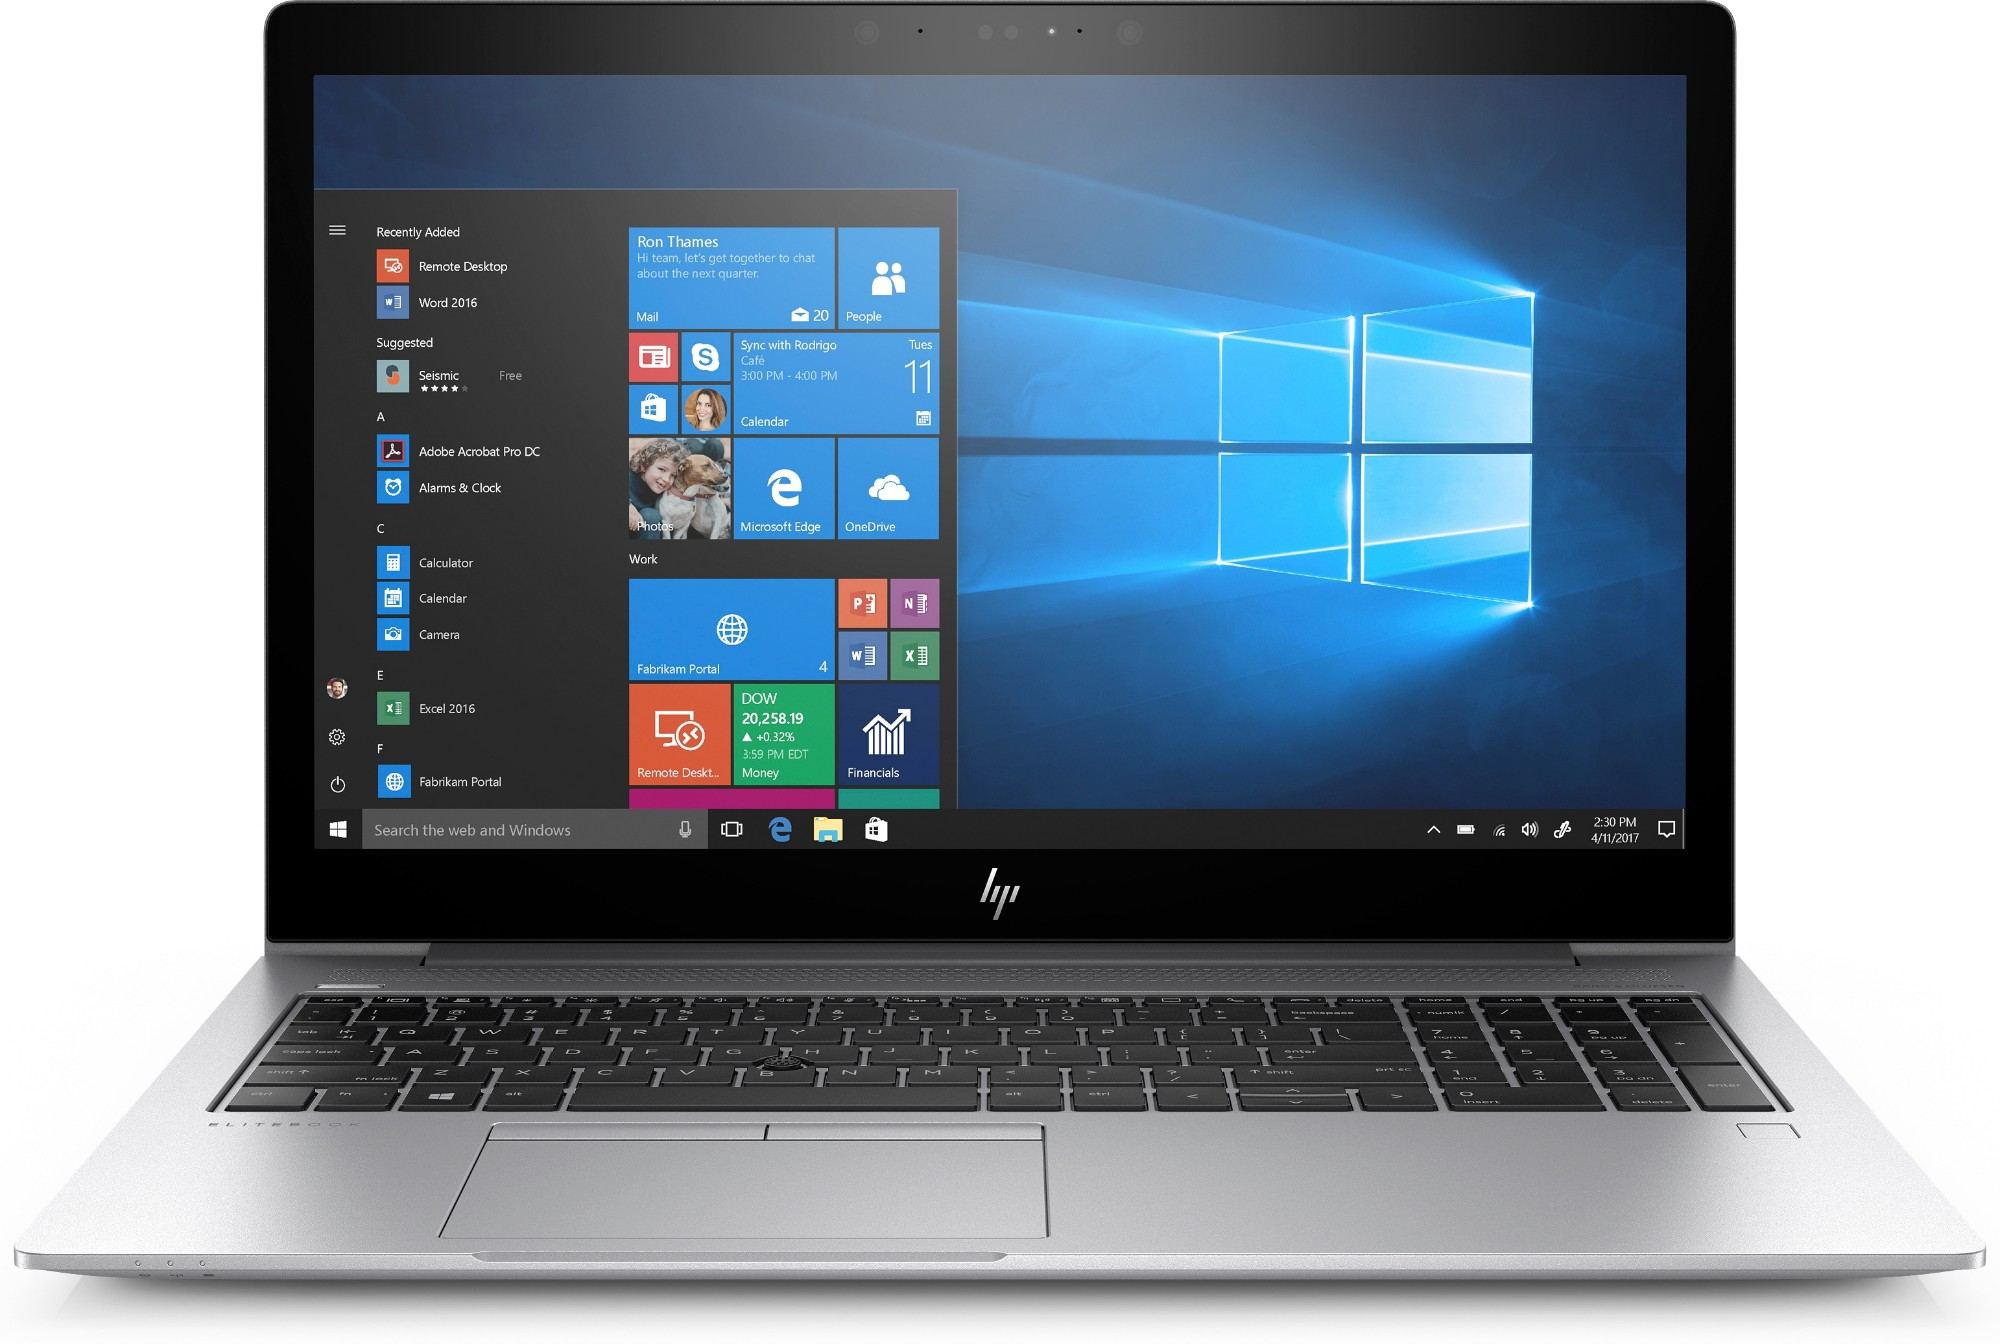 "HP EliteBook 755 G5 Portátil Plata 39,6 cm (15.6"") 1920 x 1080 Pixeles AMD Ryzen 7 PRO 8 GB DDR4-SDRAM 512 GB SSD Wi-Fi 5 (802.11ac) Windows 10 Pro"